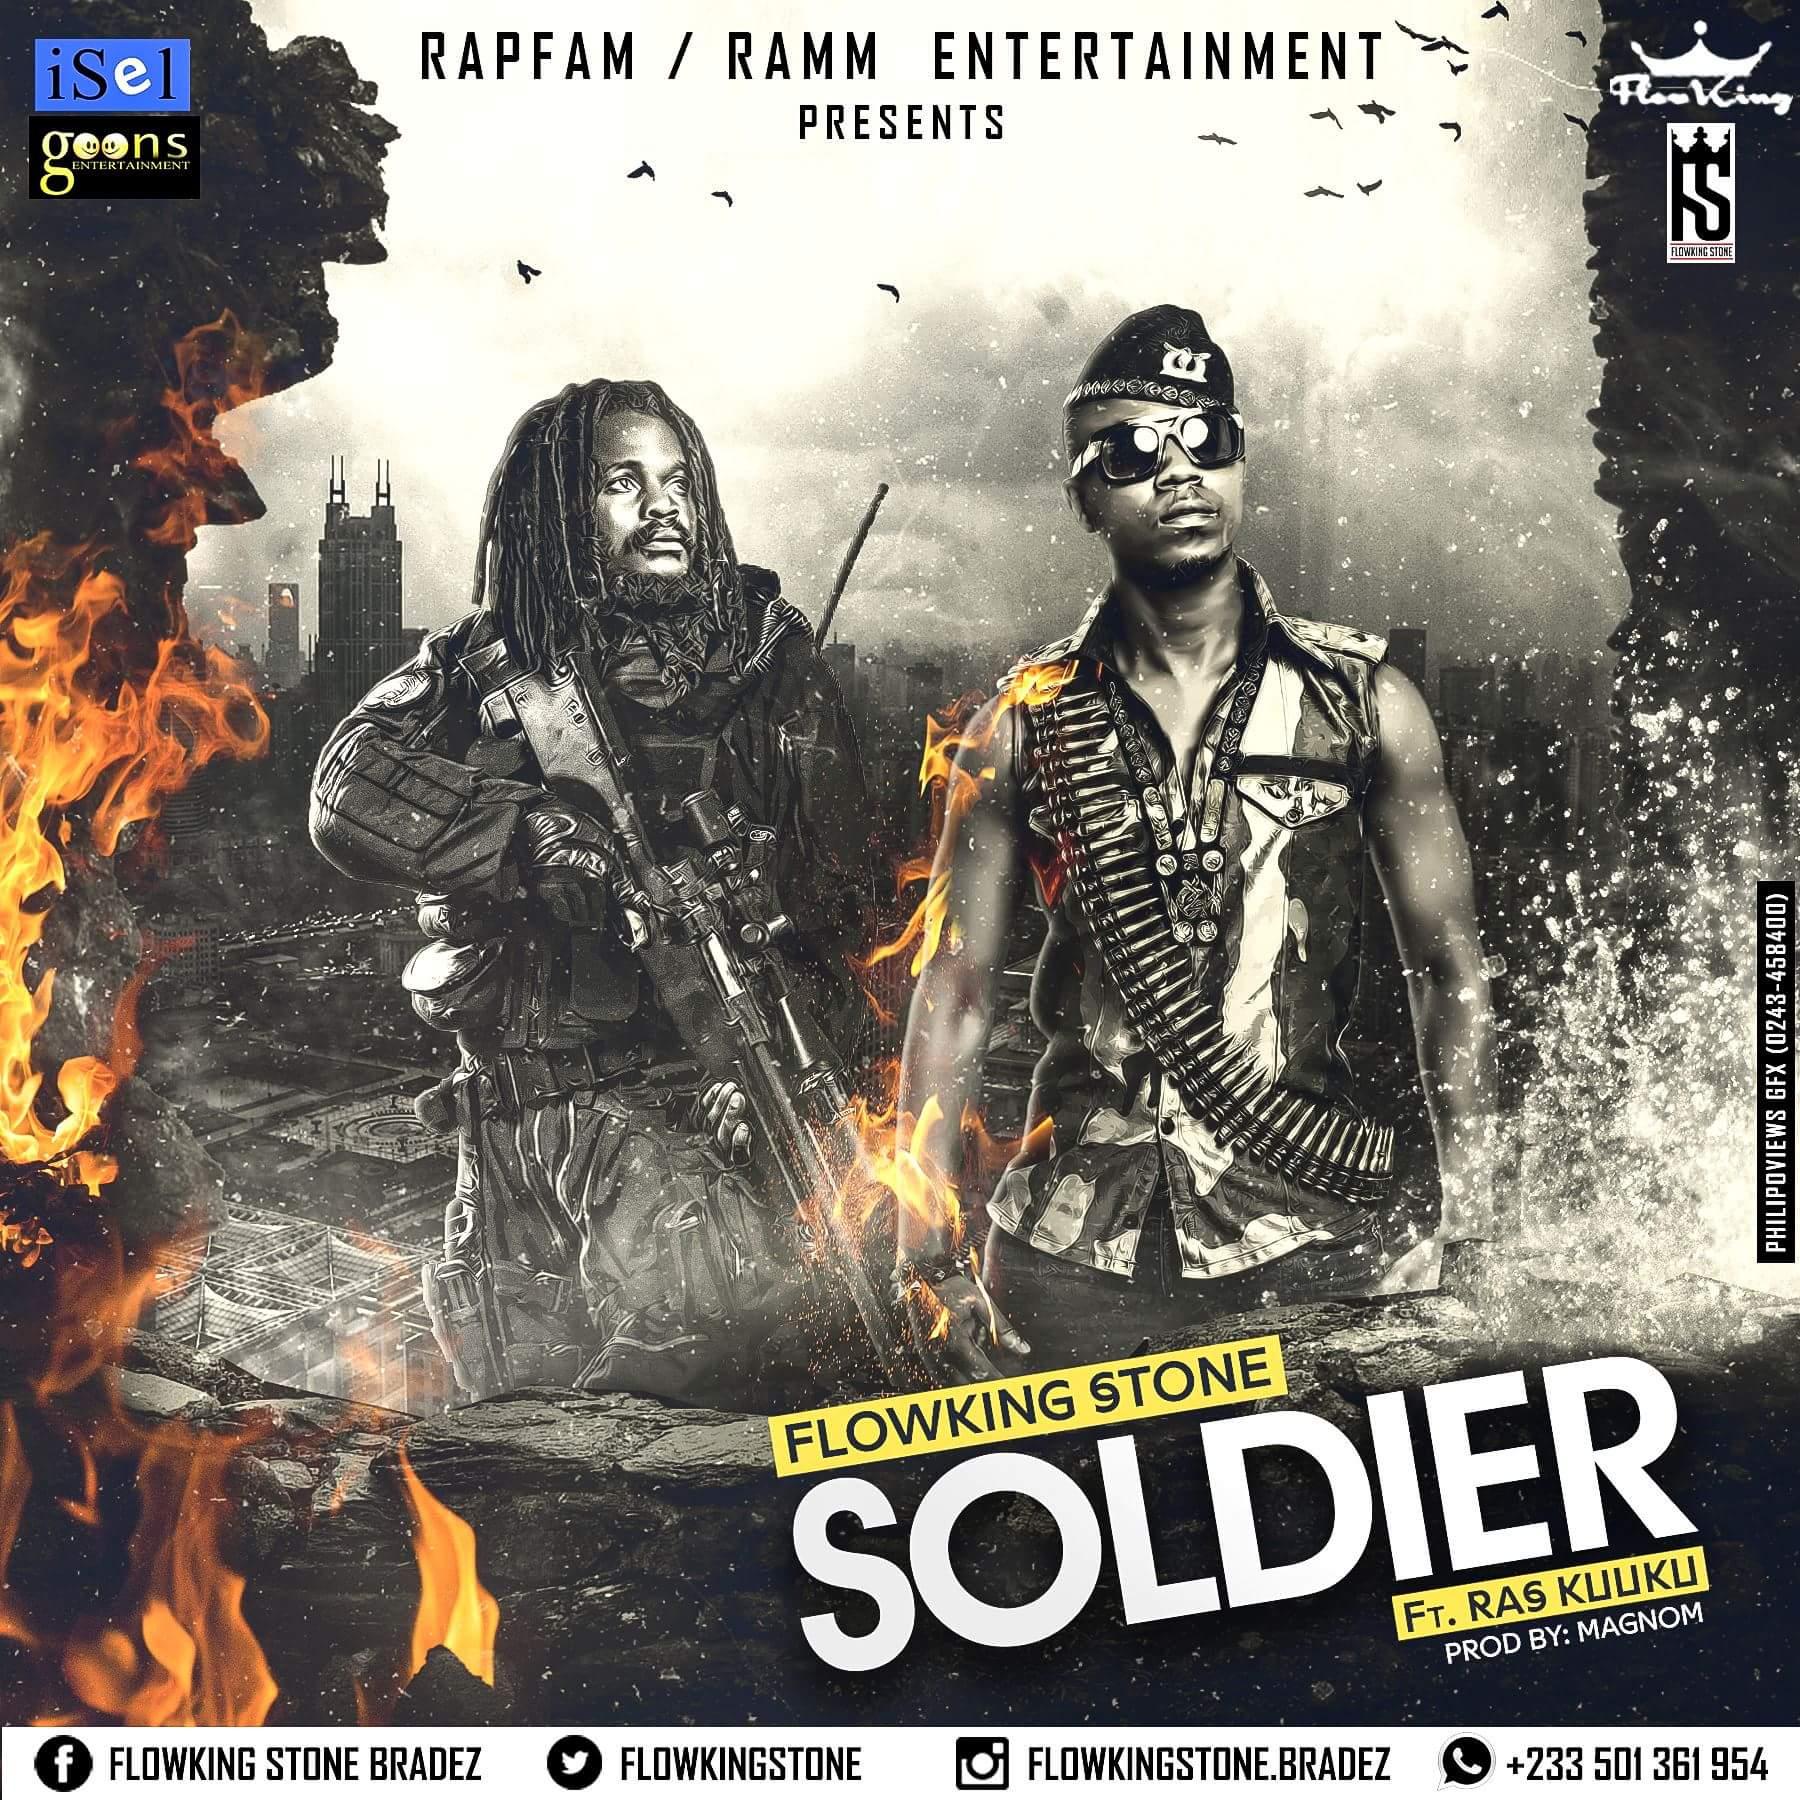 FlowKing Stone Soldier ft Ras Kuuku Prod